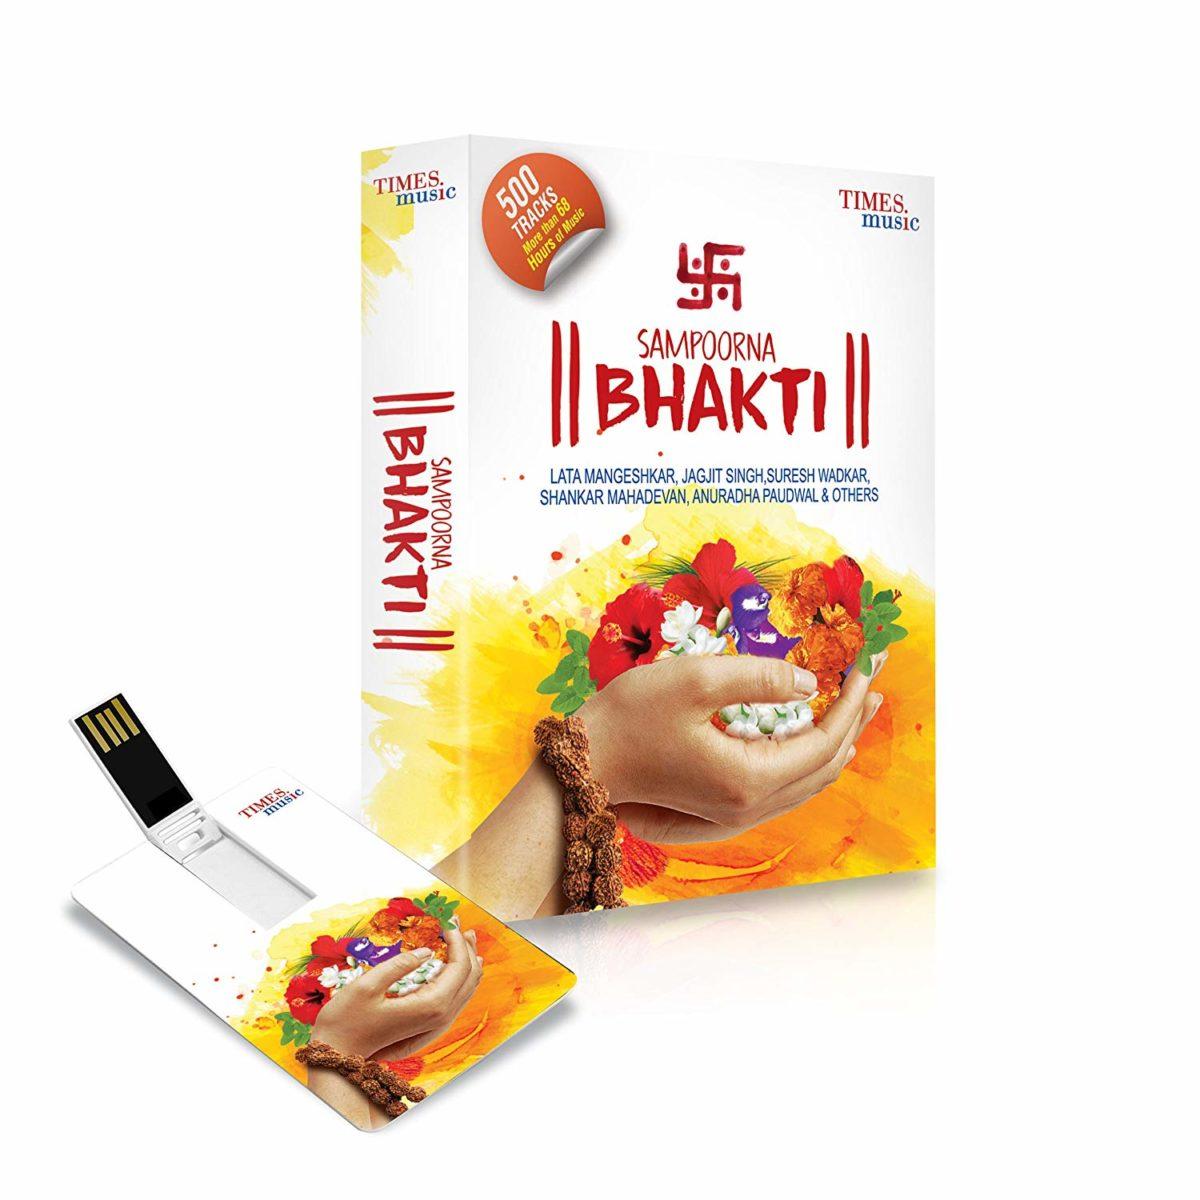 Music Card: Sampoorn Bhakti - 320 kbps MP3 Audio (16 GB)